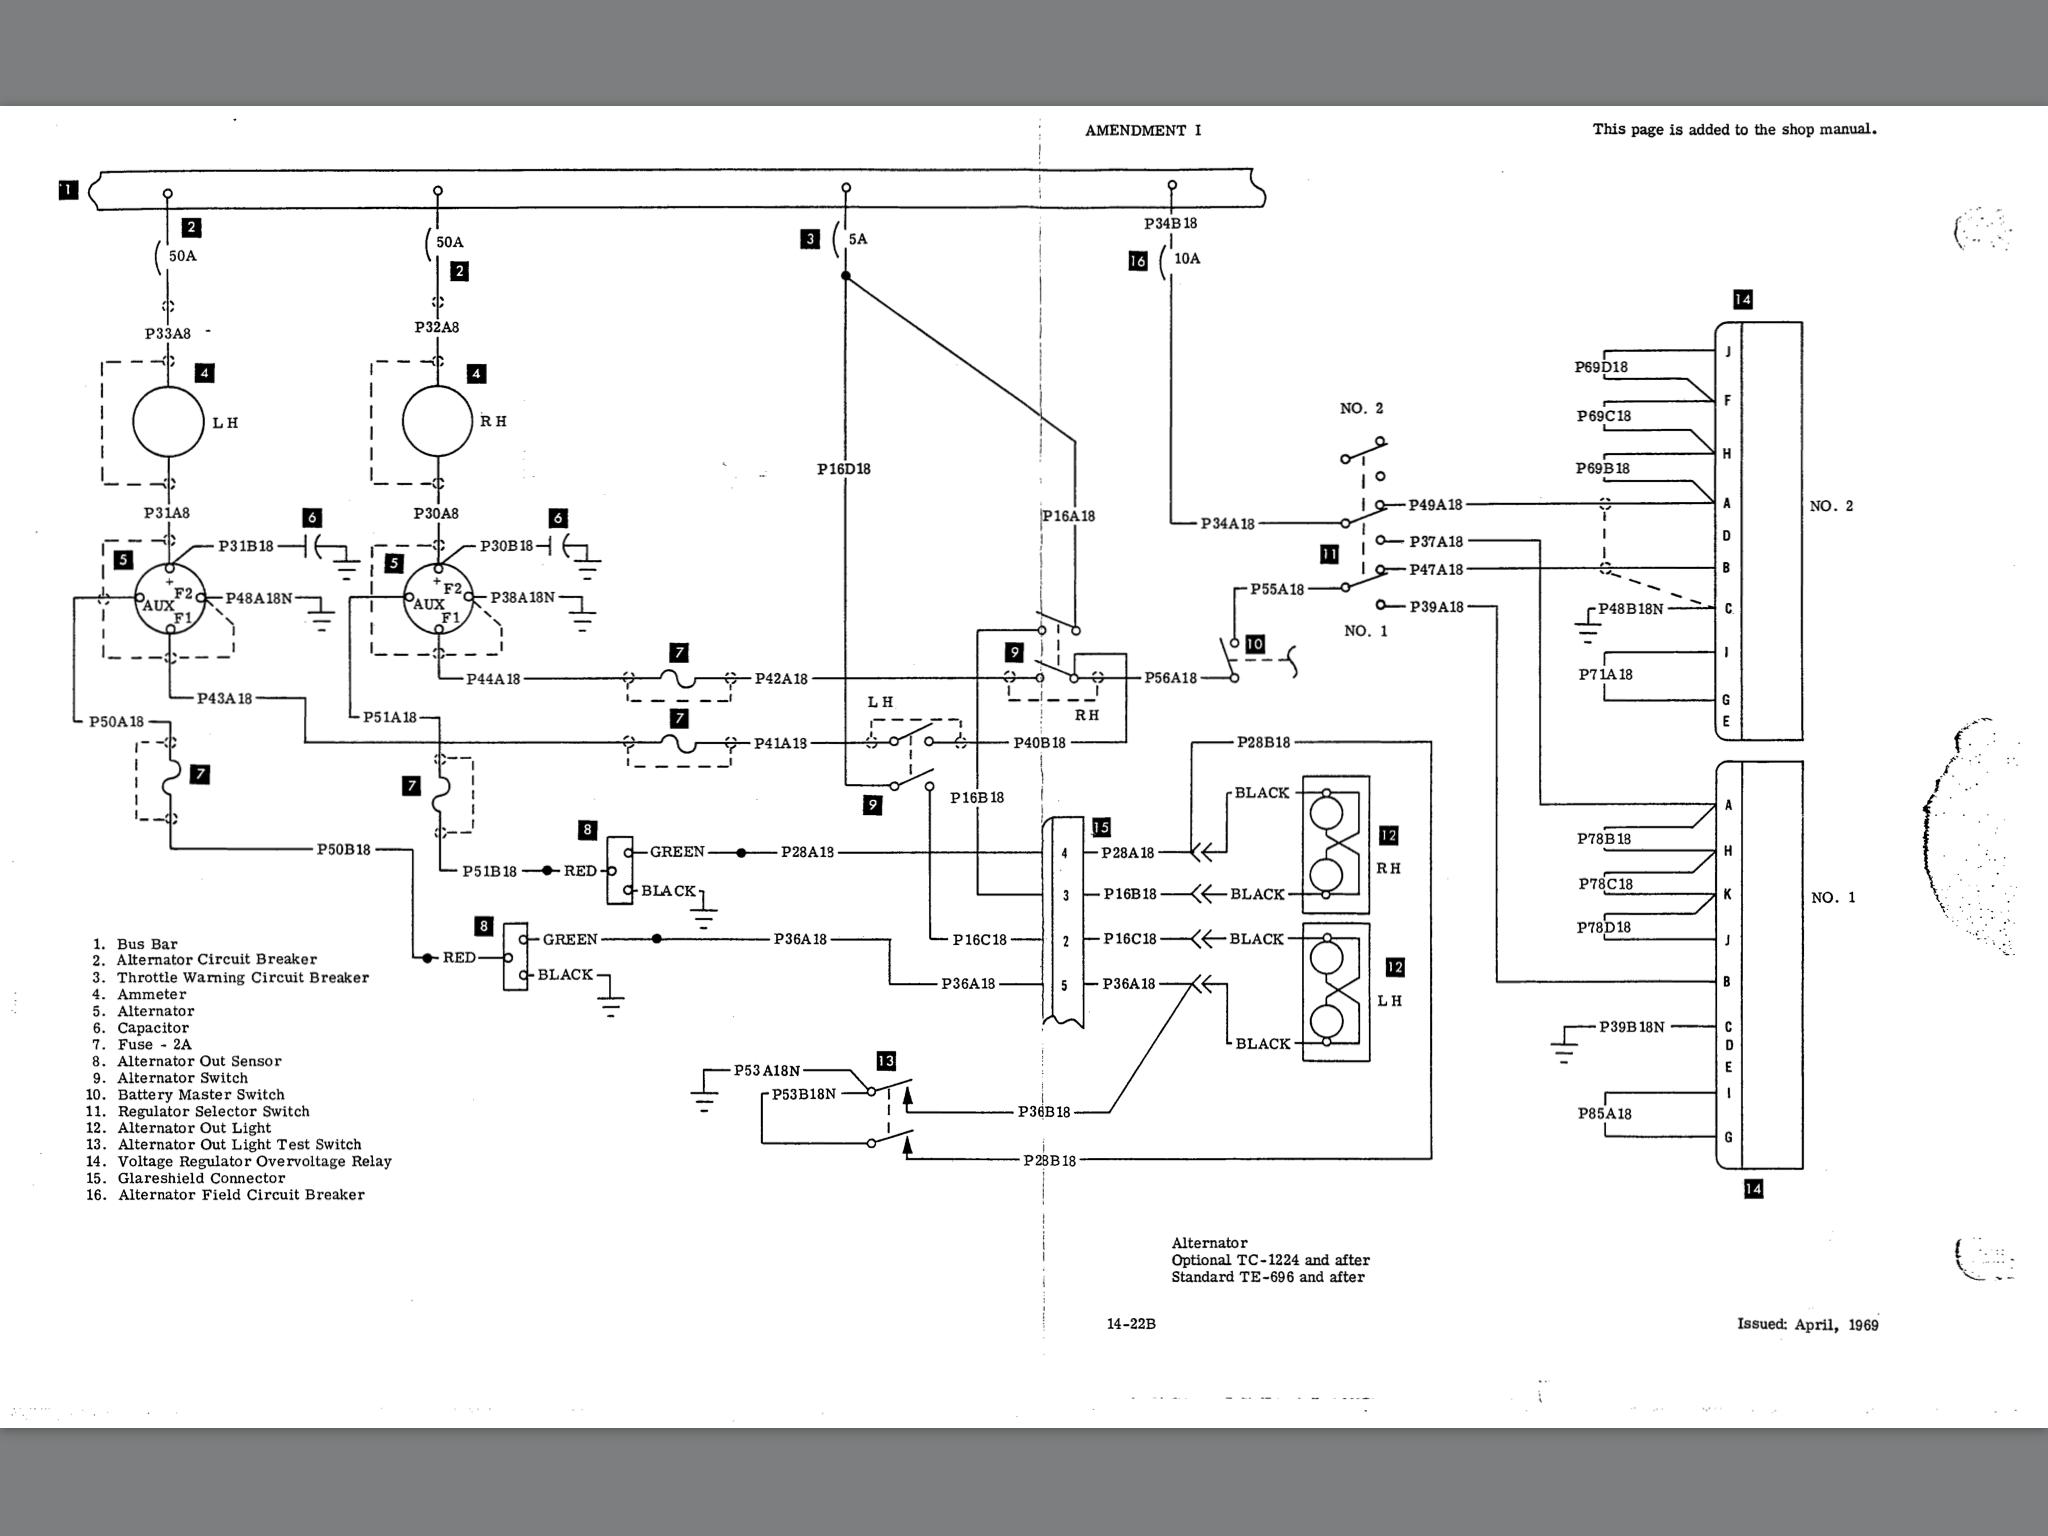 Wiring Diagram For Beech